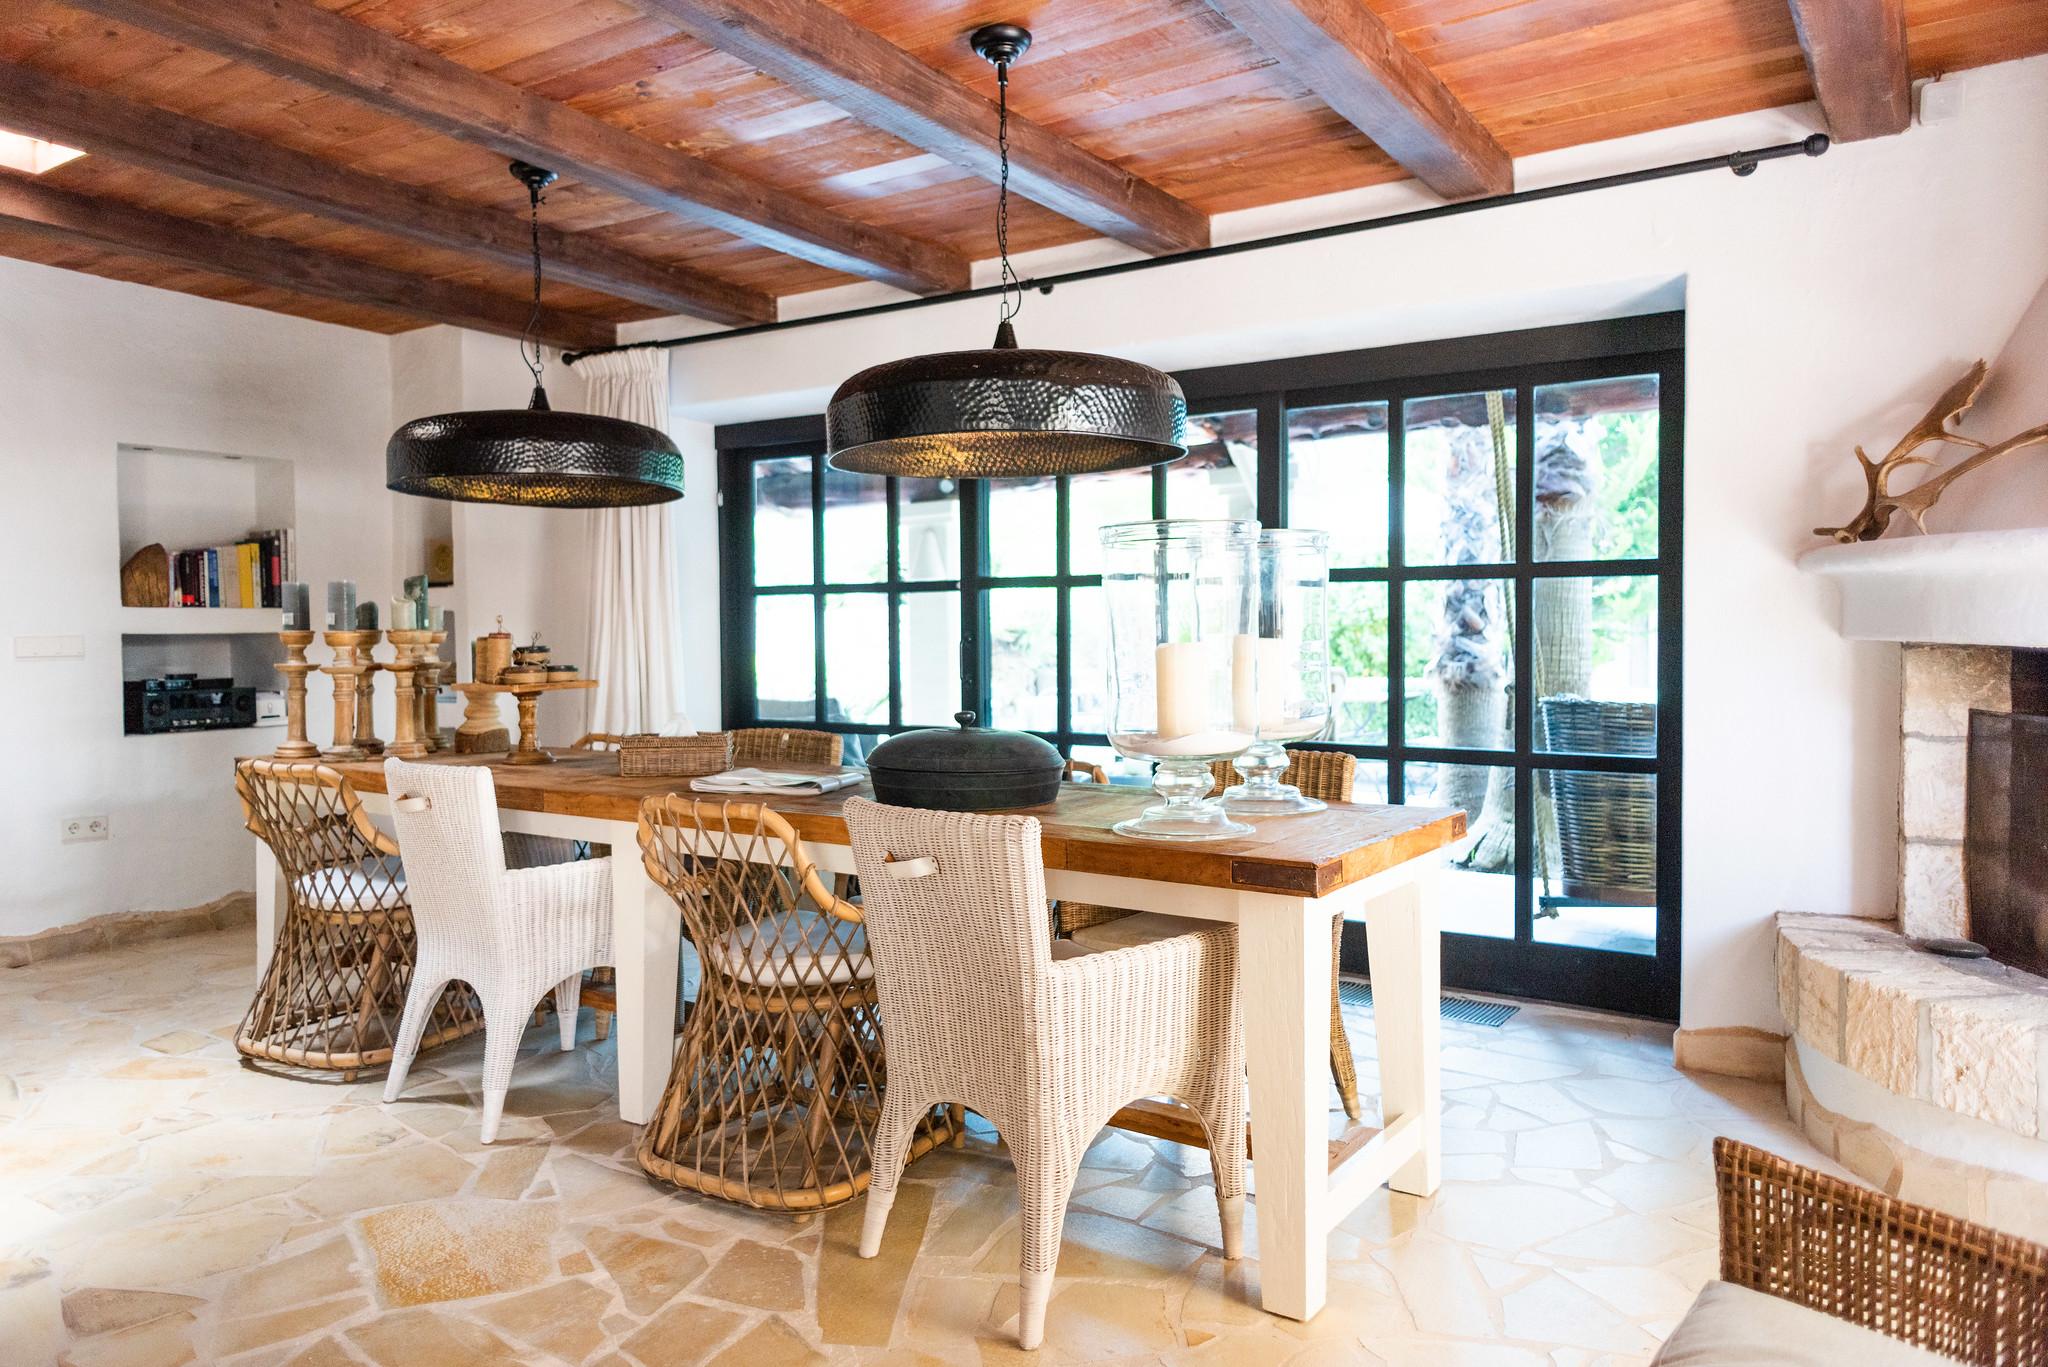 https://www.white-ibiza.com/wp-content/uploads/2020/05/white-ibiza-villas-can-riviere-interior-dining.jpg